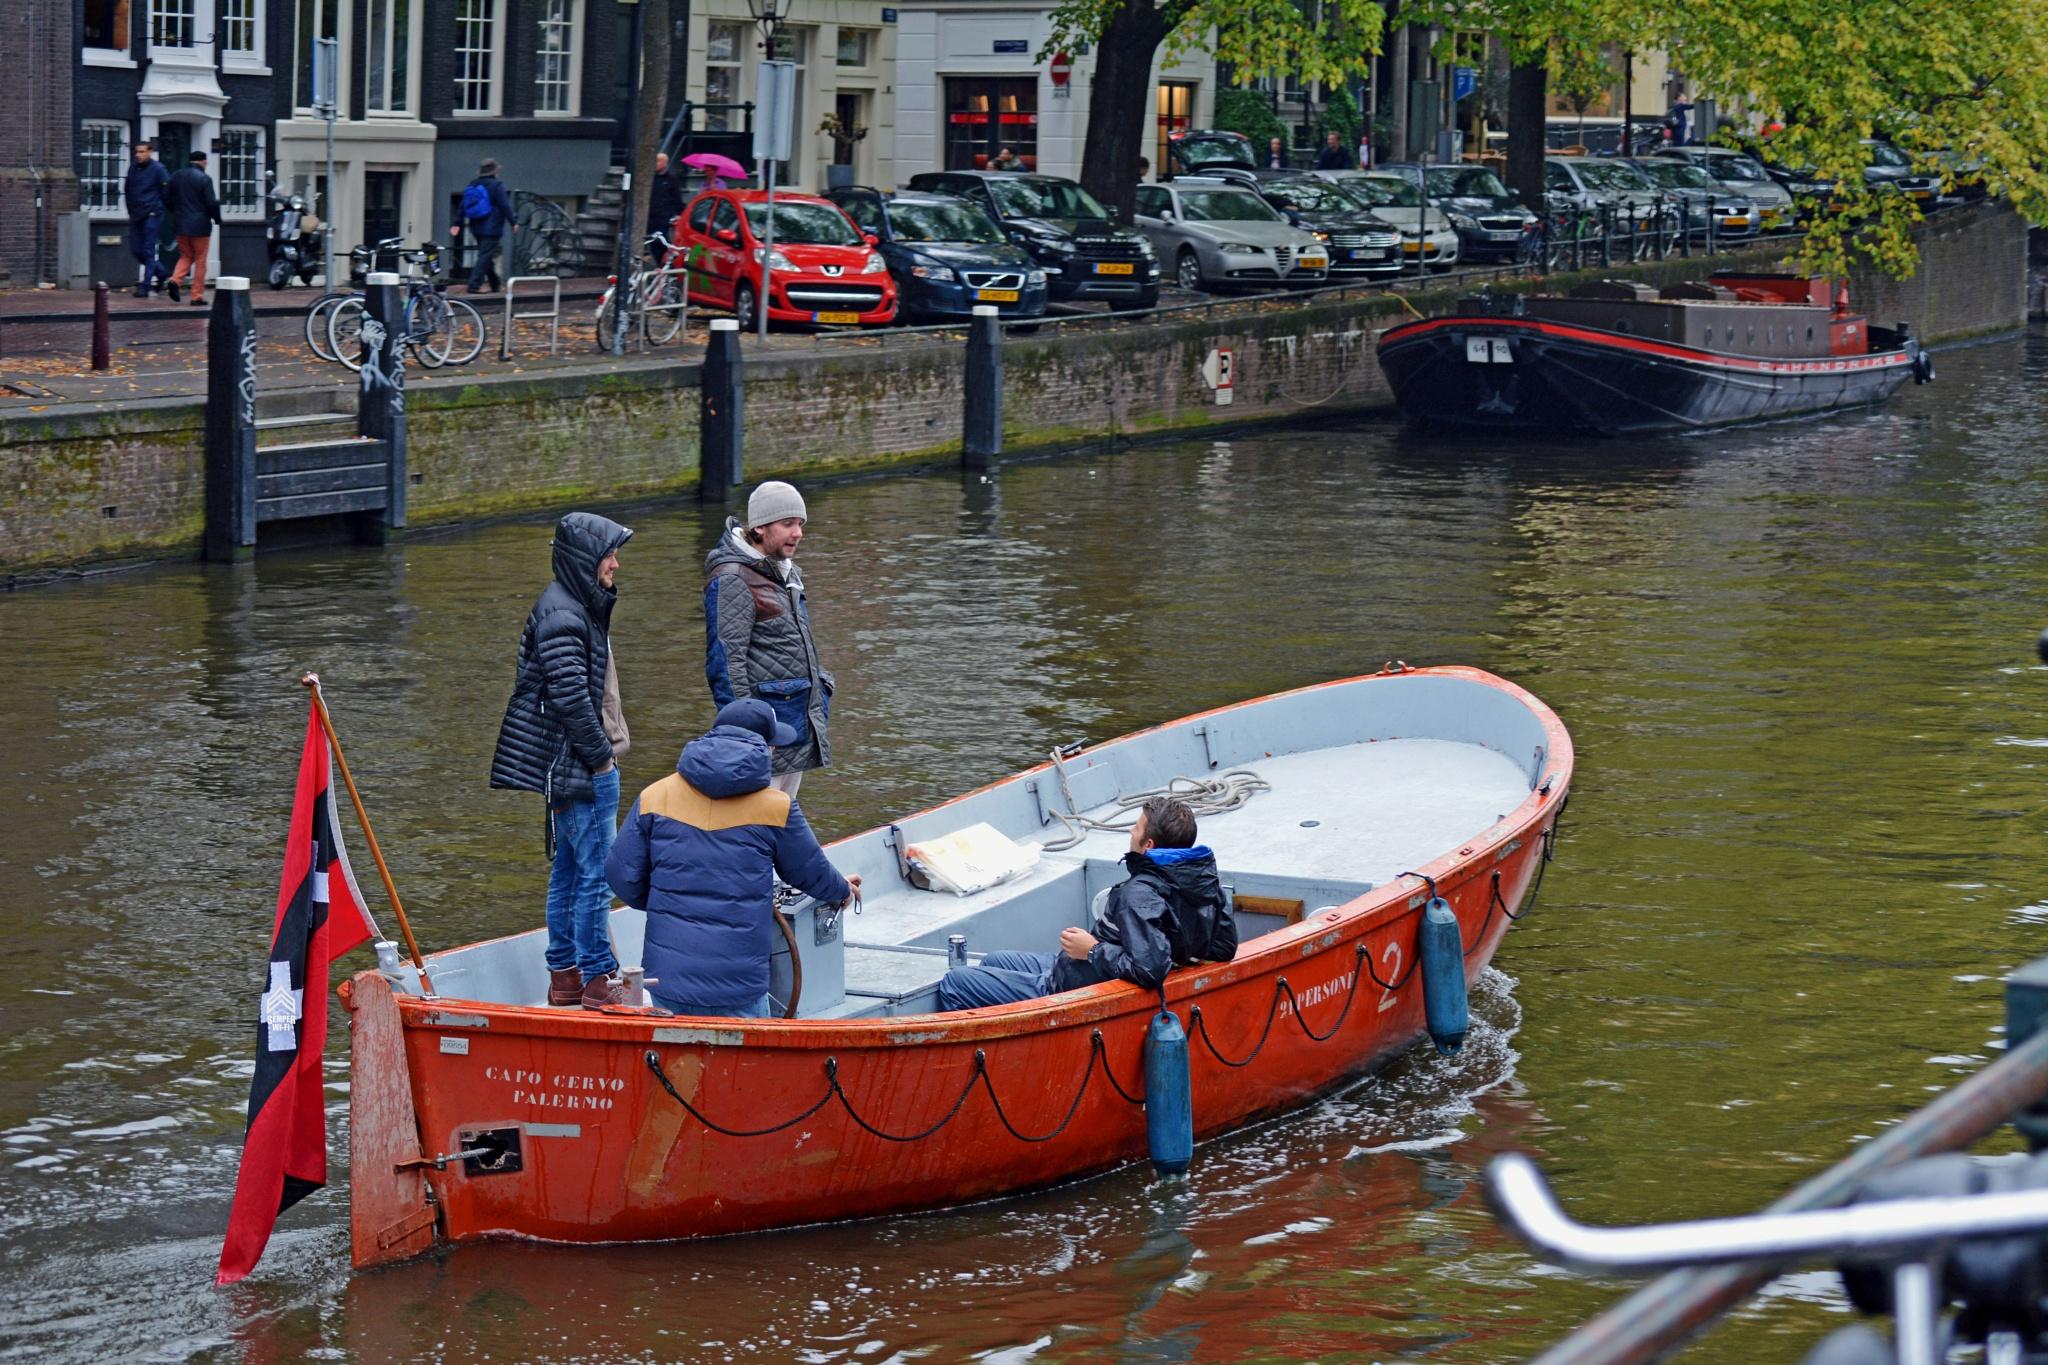 Colorful Boat Ride in Amsterdam by semperwifi